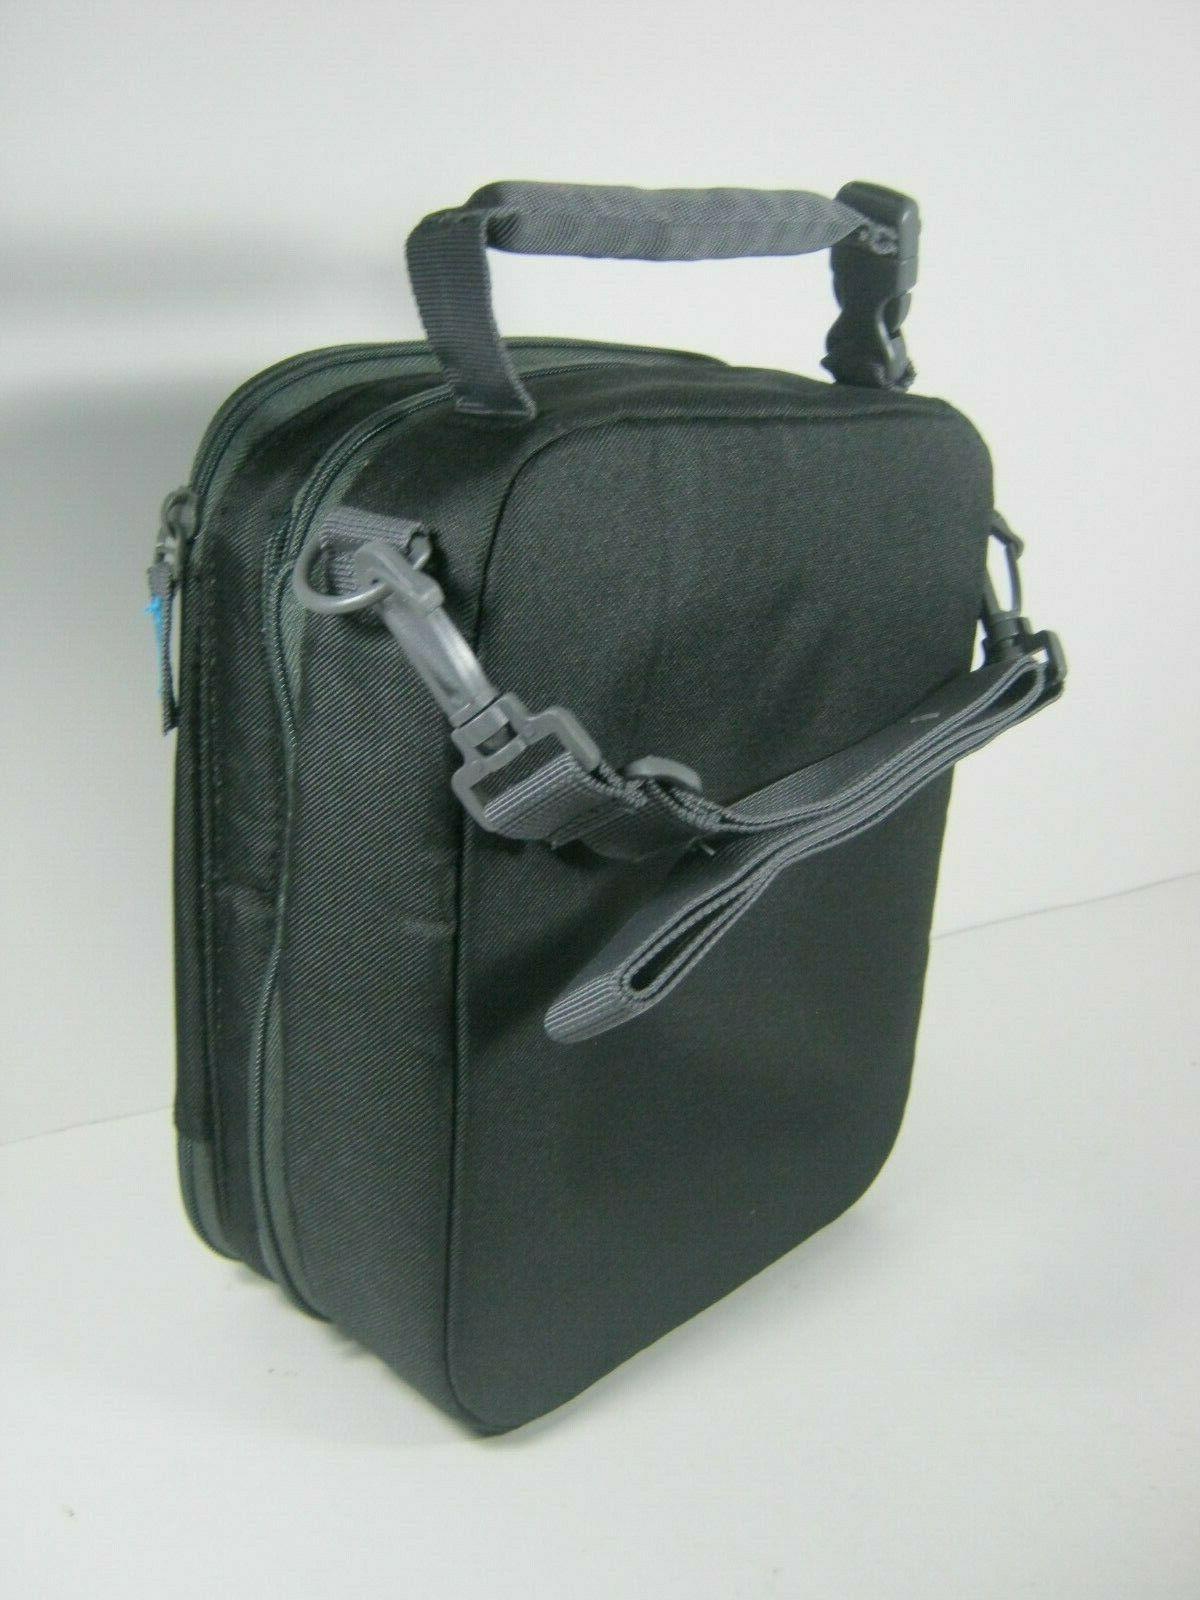 Columbia Lunch Box Grid Bag